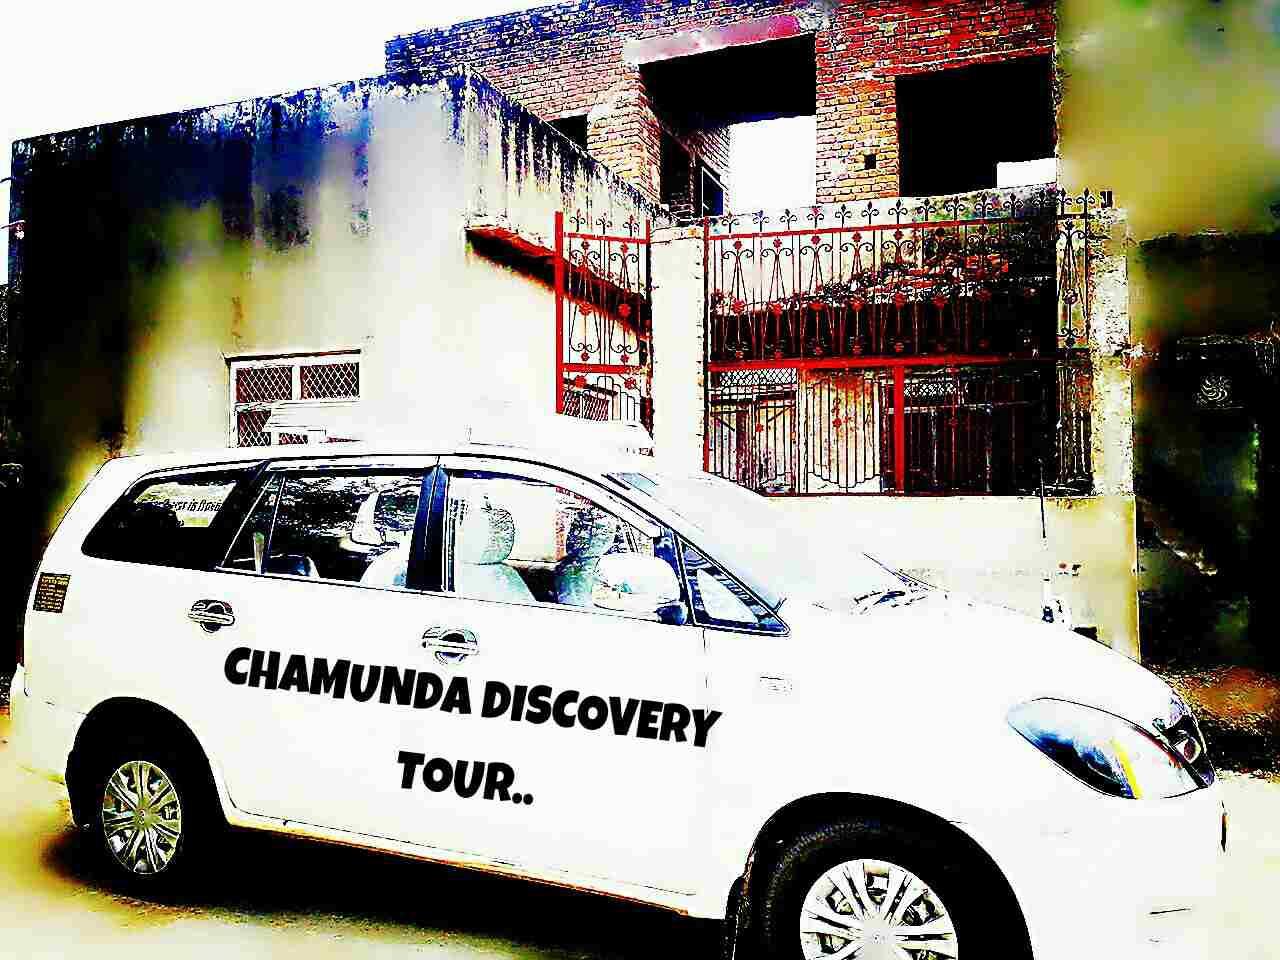 Chamunda tour